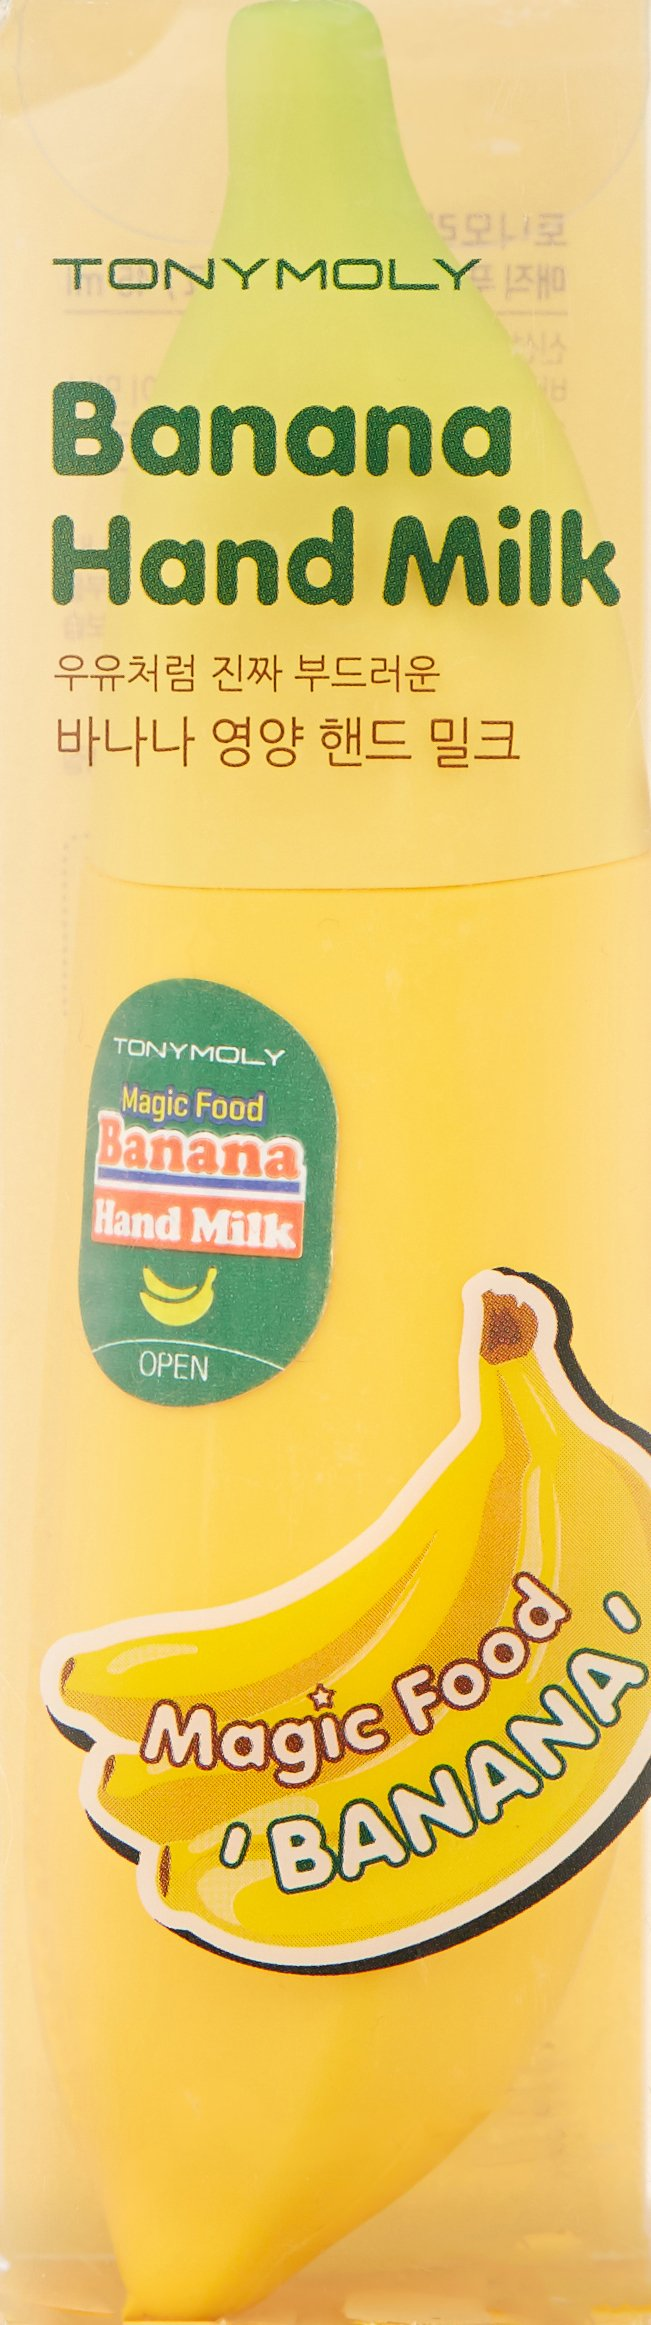 TONYMOLY Magic Food Banana Hand Milk by TONYMOLY (Image #2)